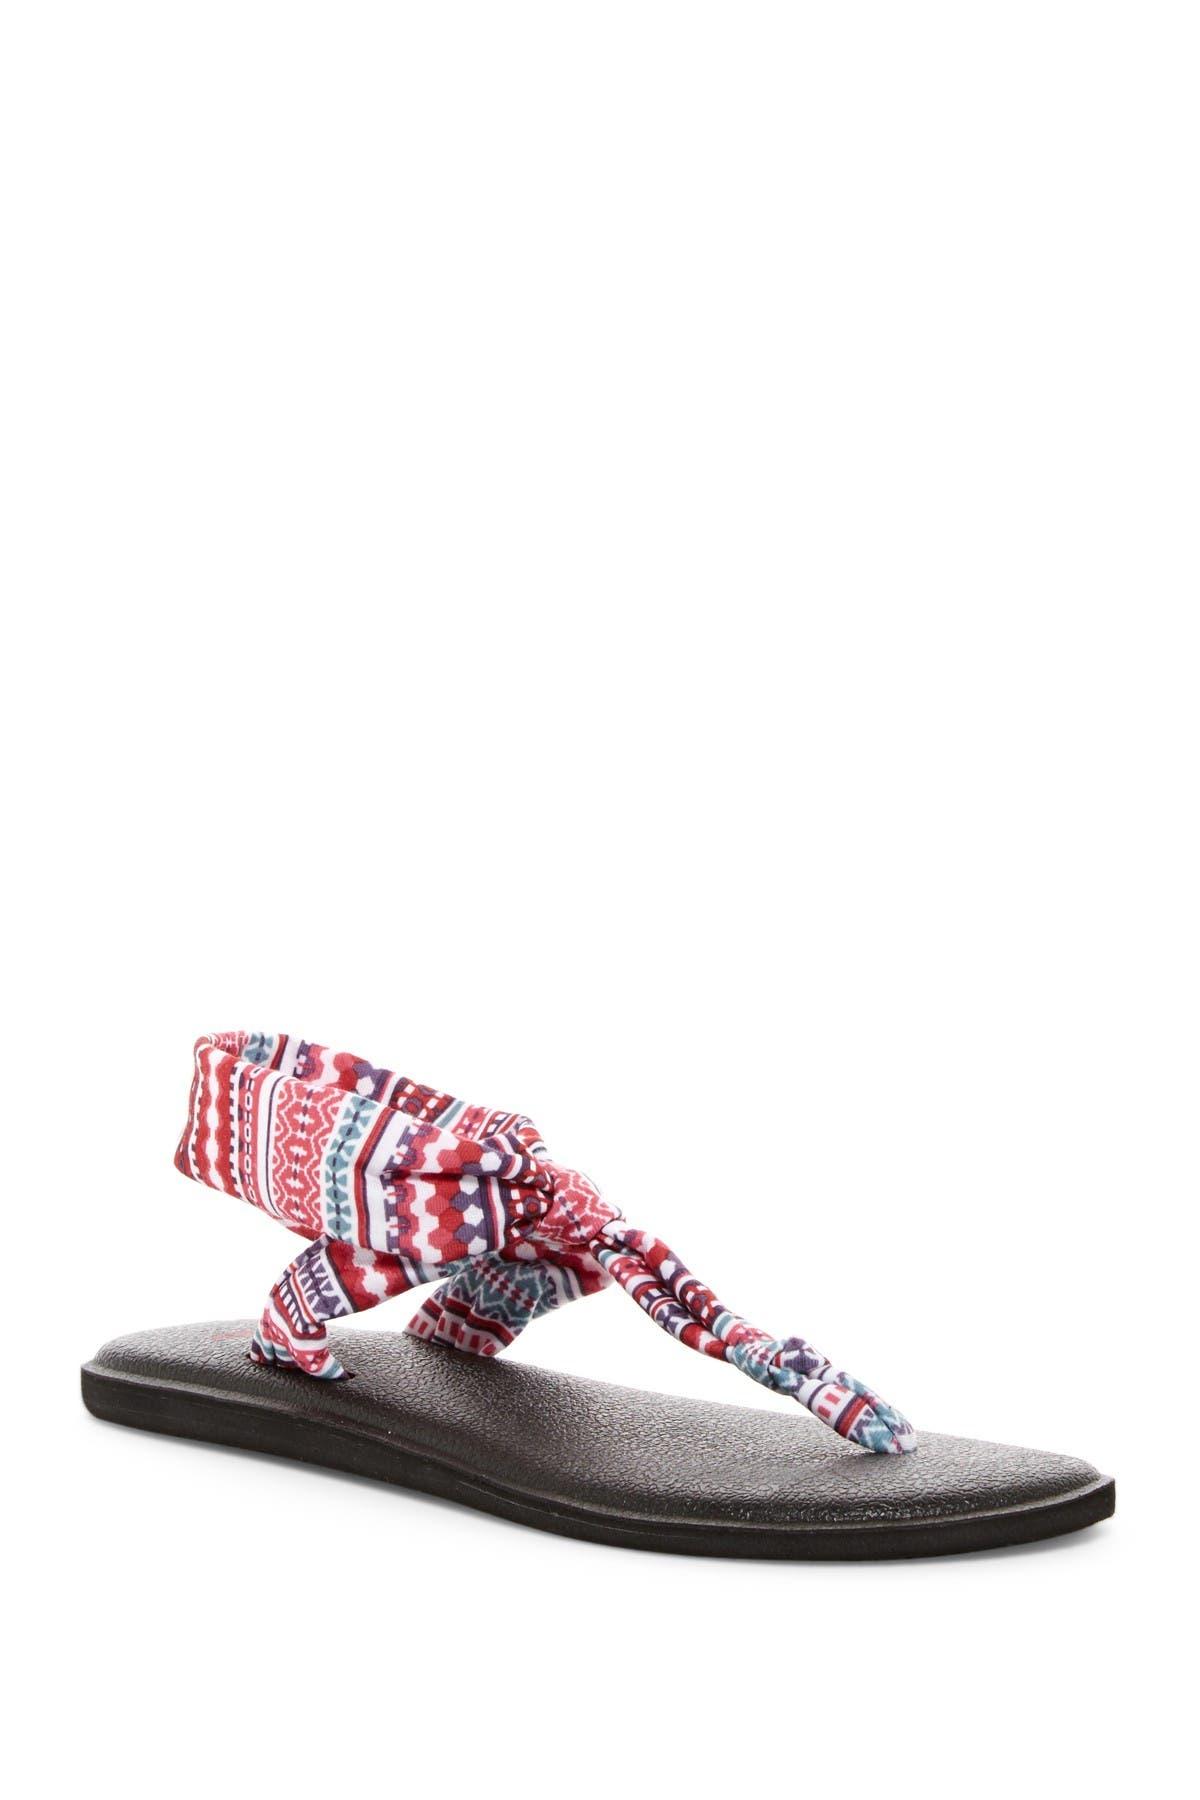 Image of Sanuk Yoga Sling Ella Sandal